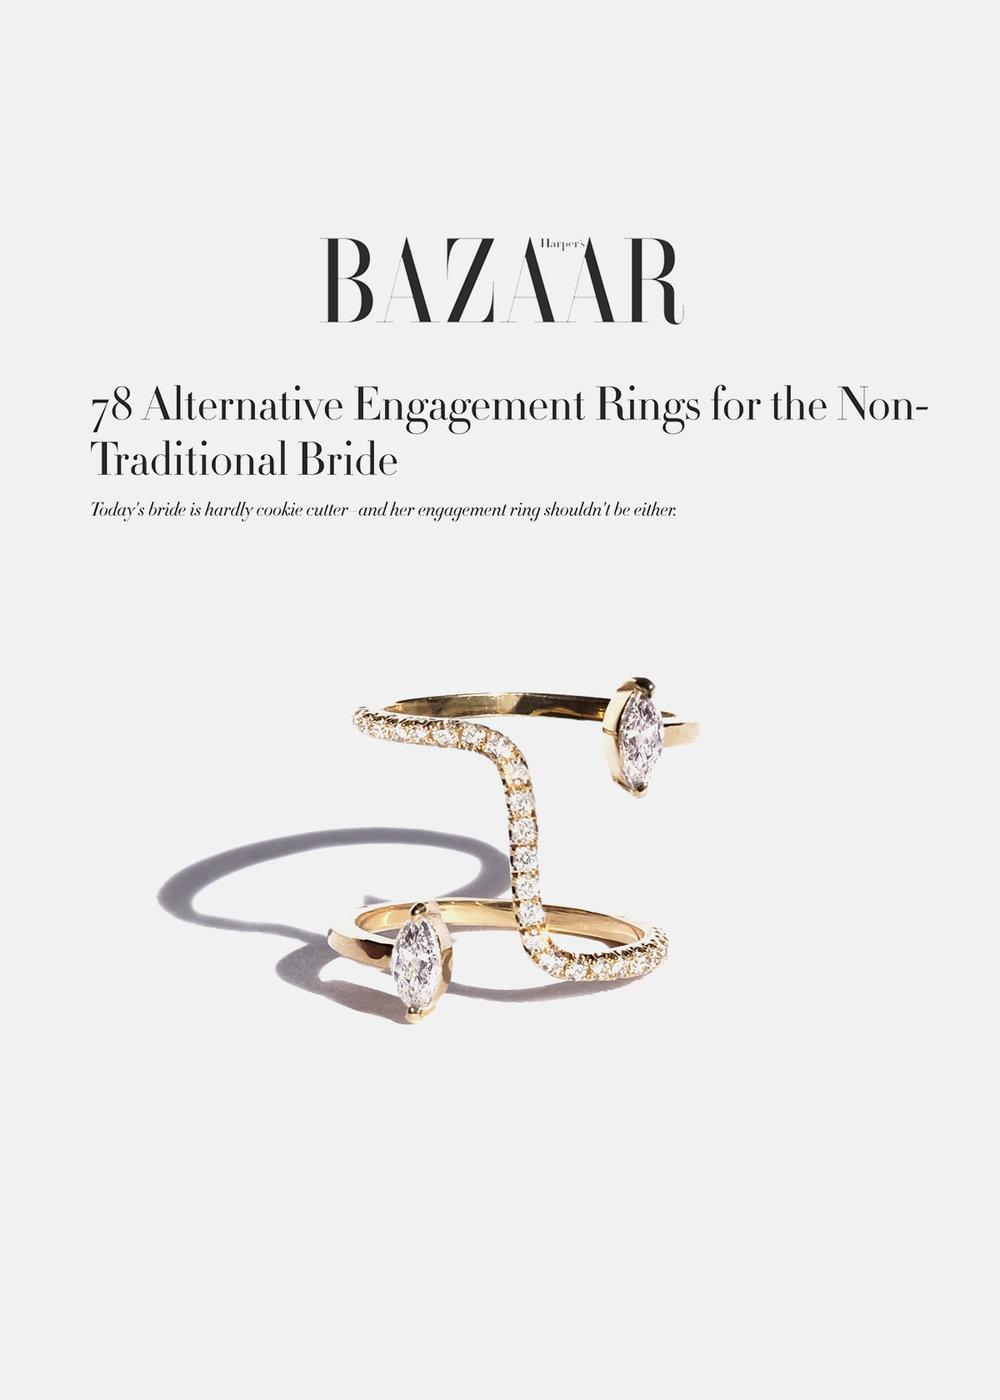 Bazaar2.jpg